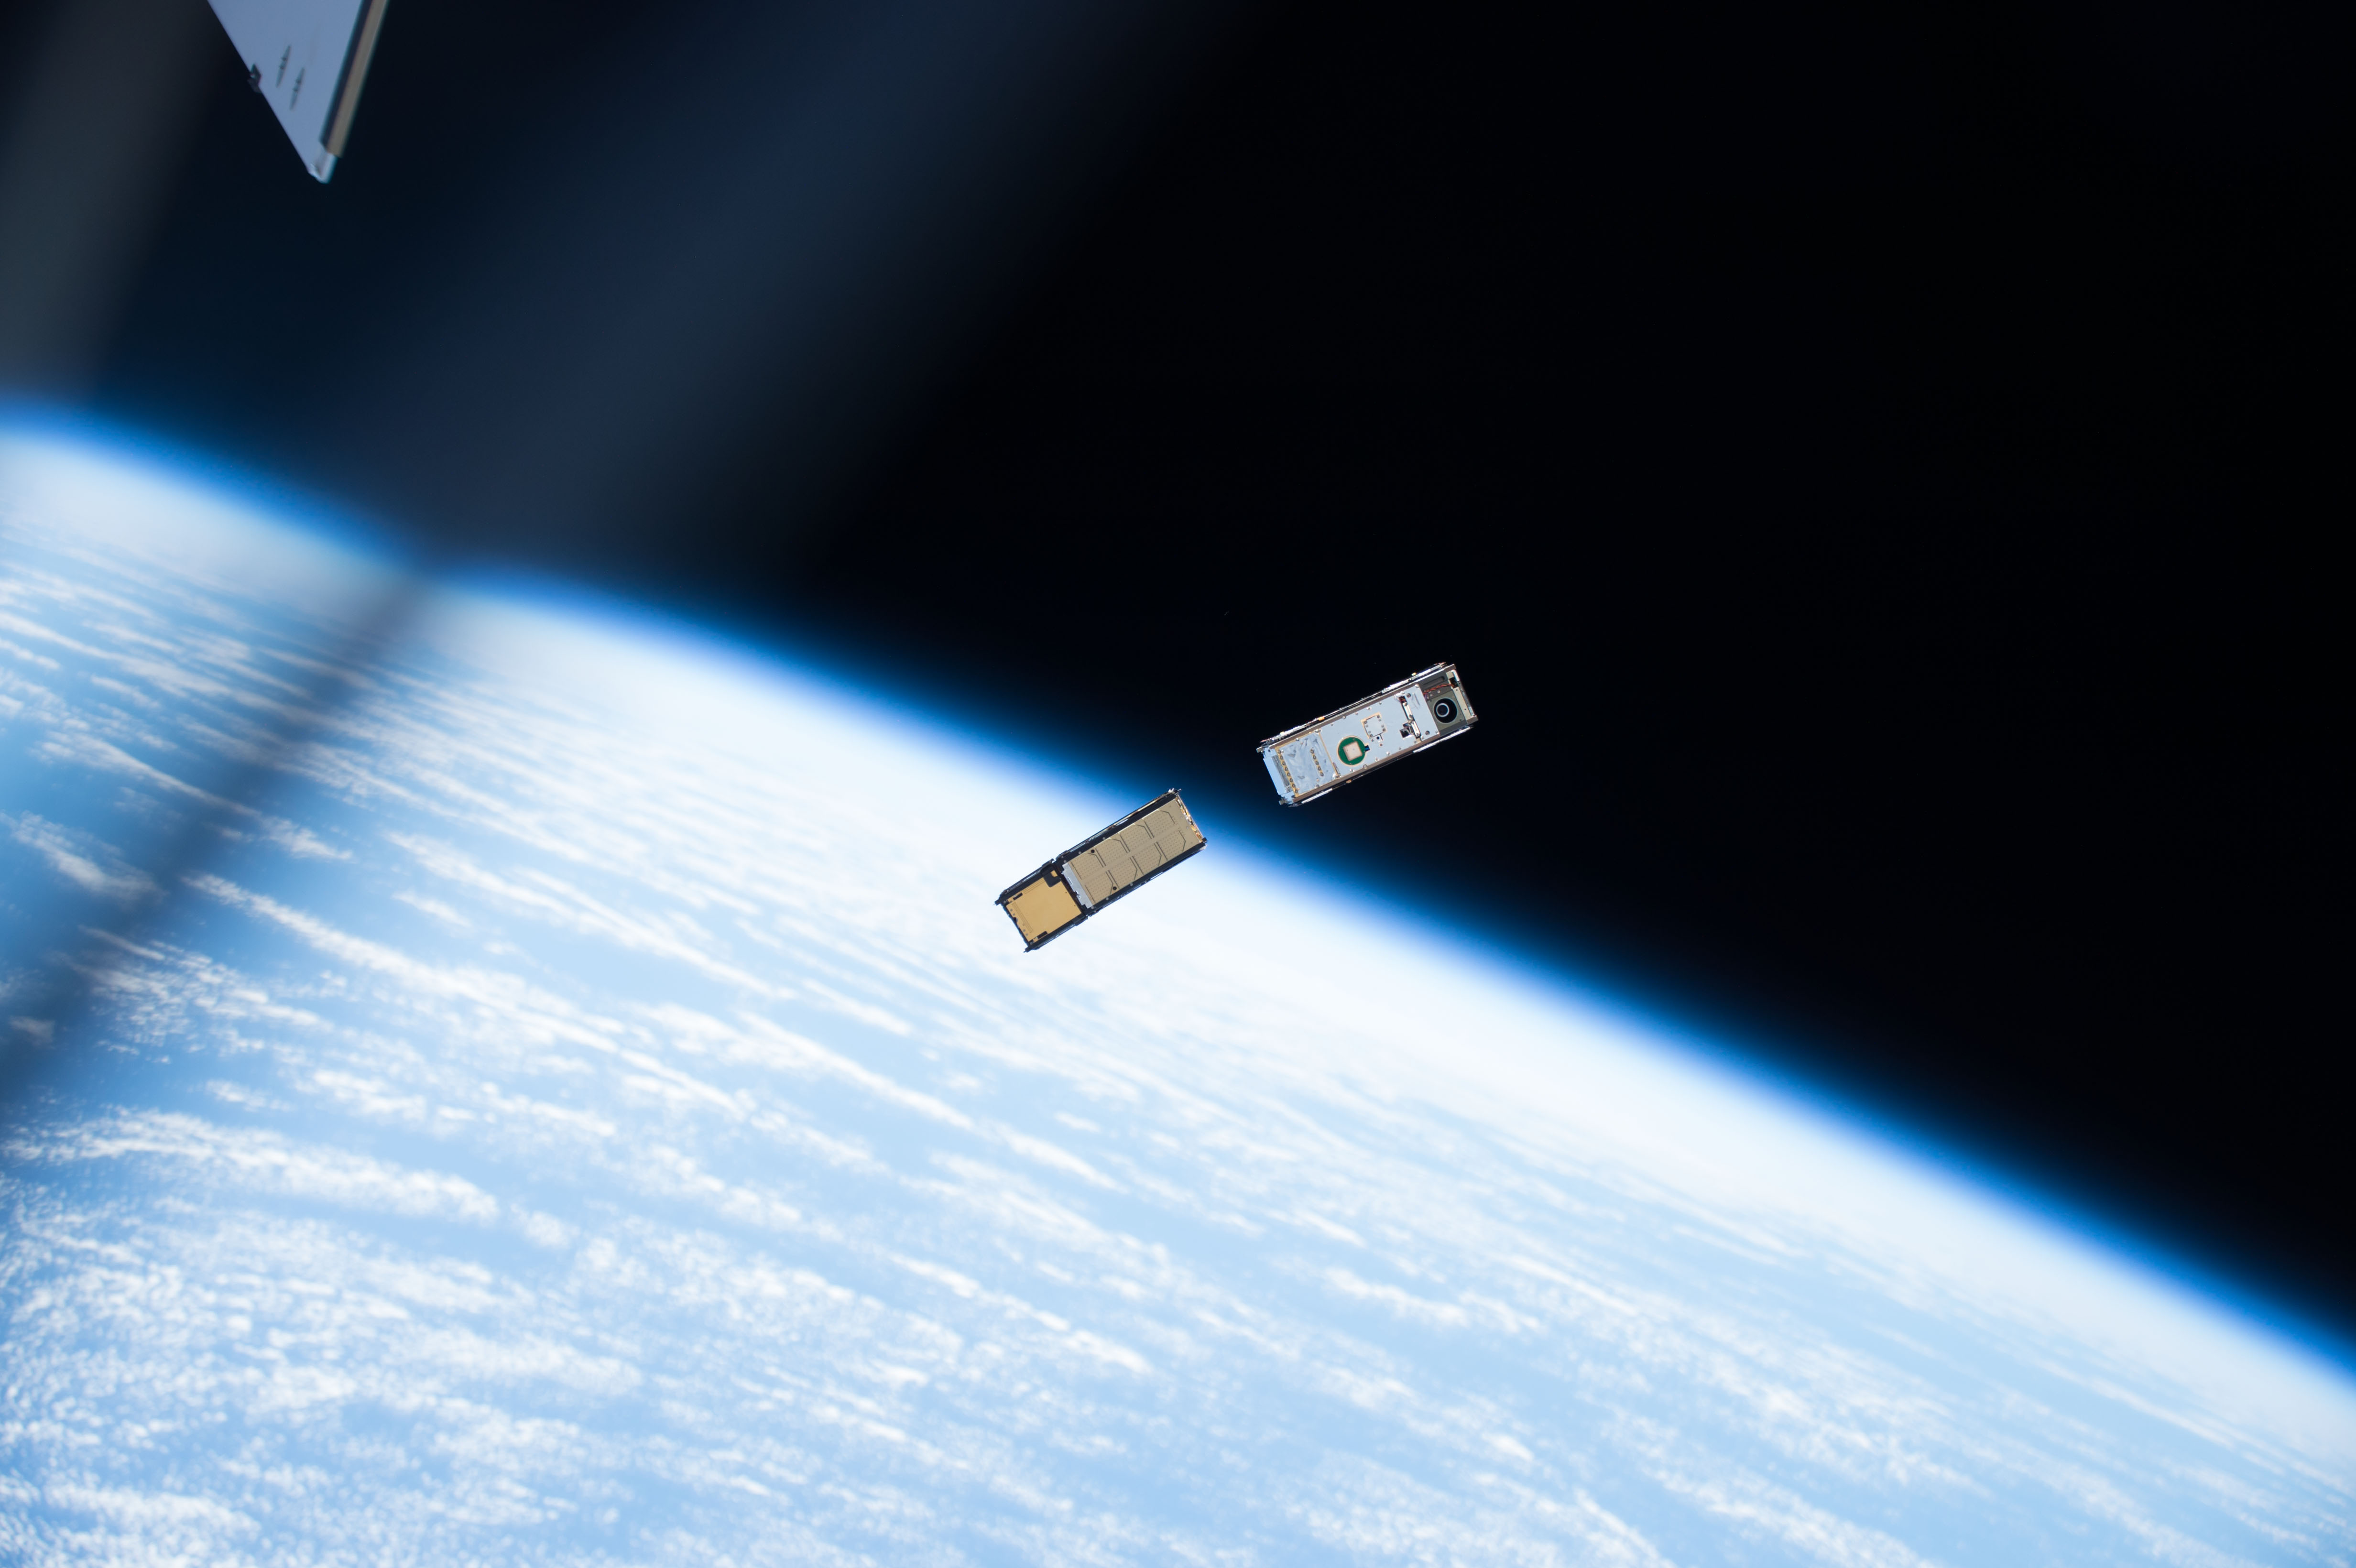 NASA's Small Spacecraft Makes 1st 883-Gigahertz Global Ice